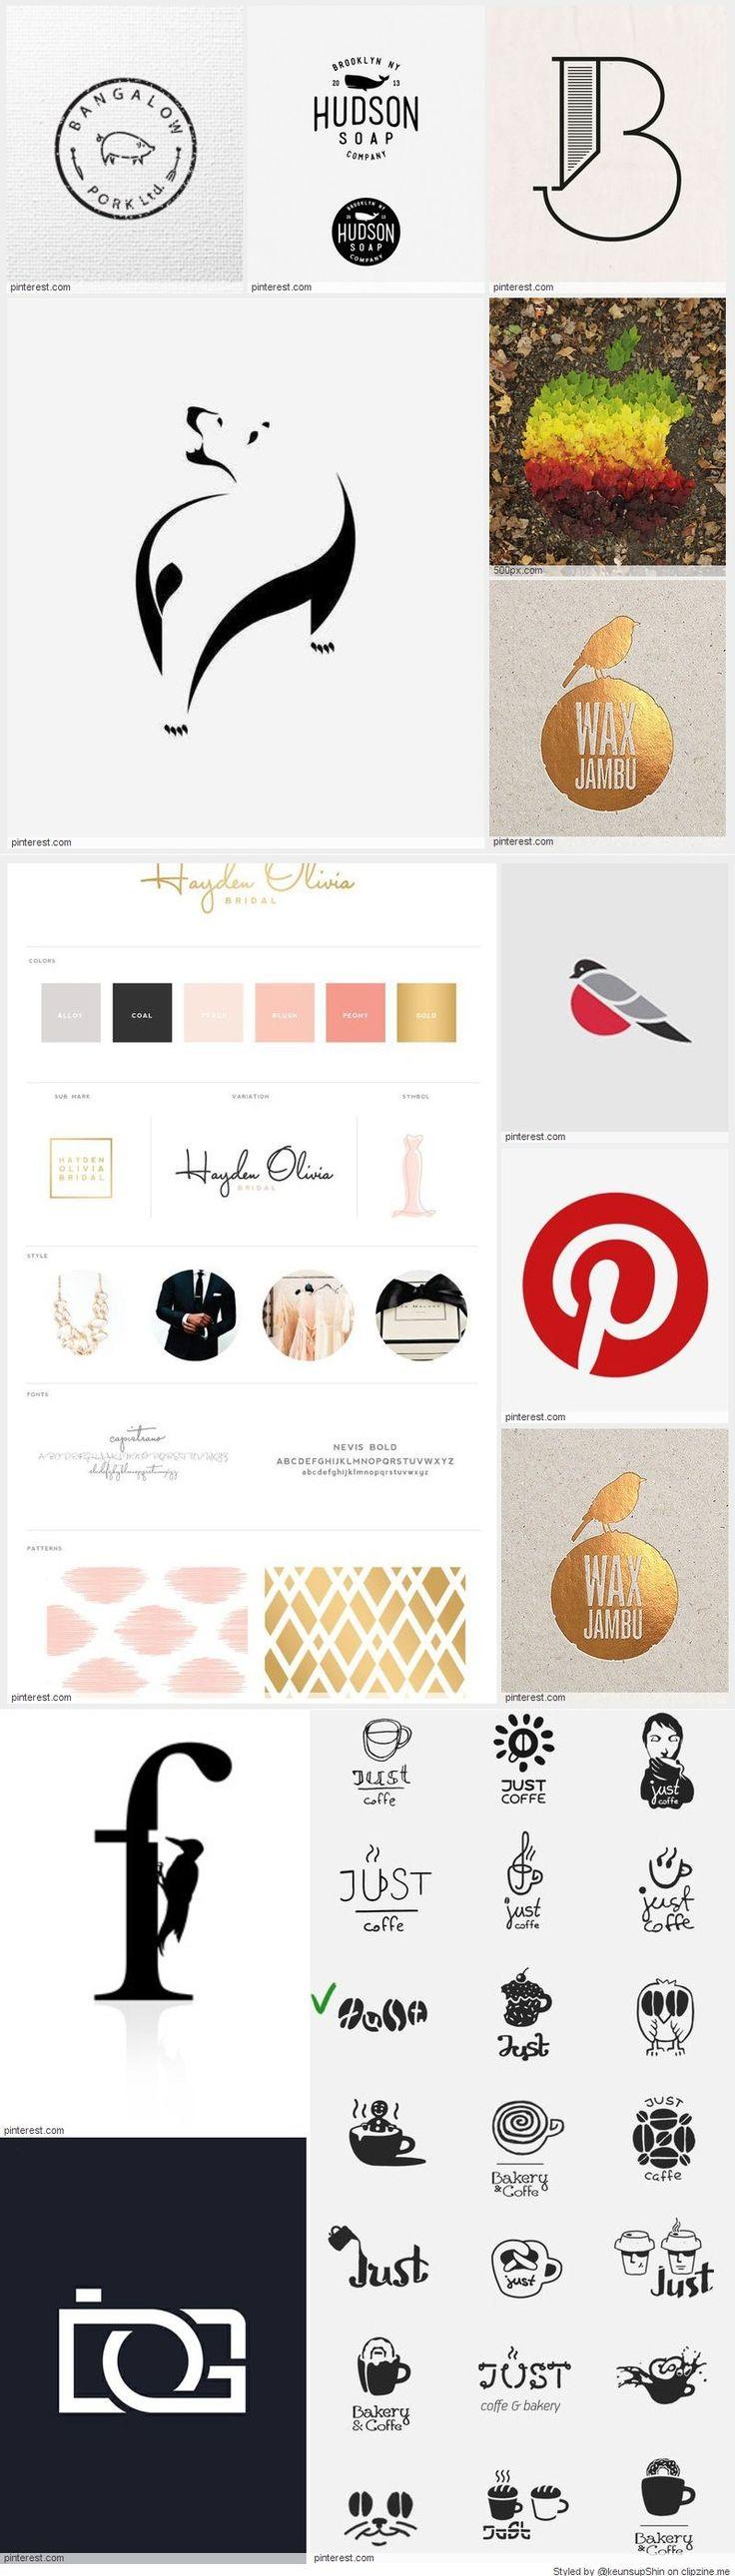 Mejores 19 imágenes de Inspiration logos en Pinterest   Diseño de ...